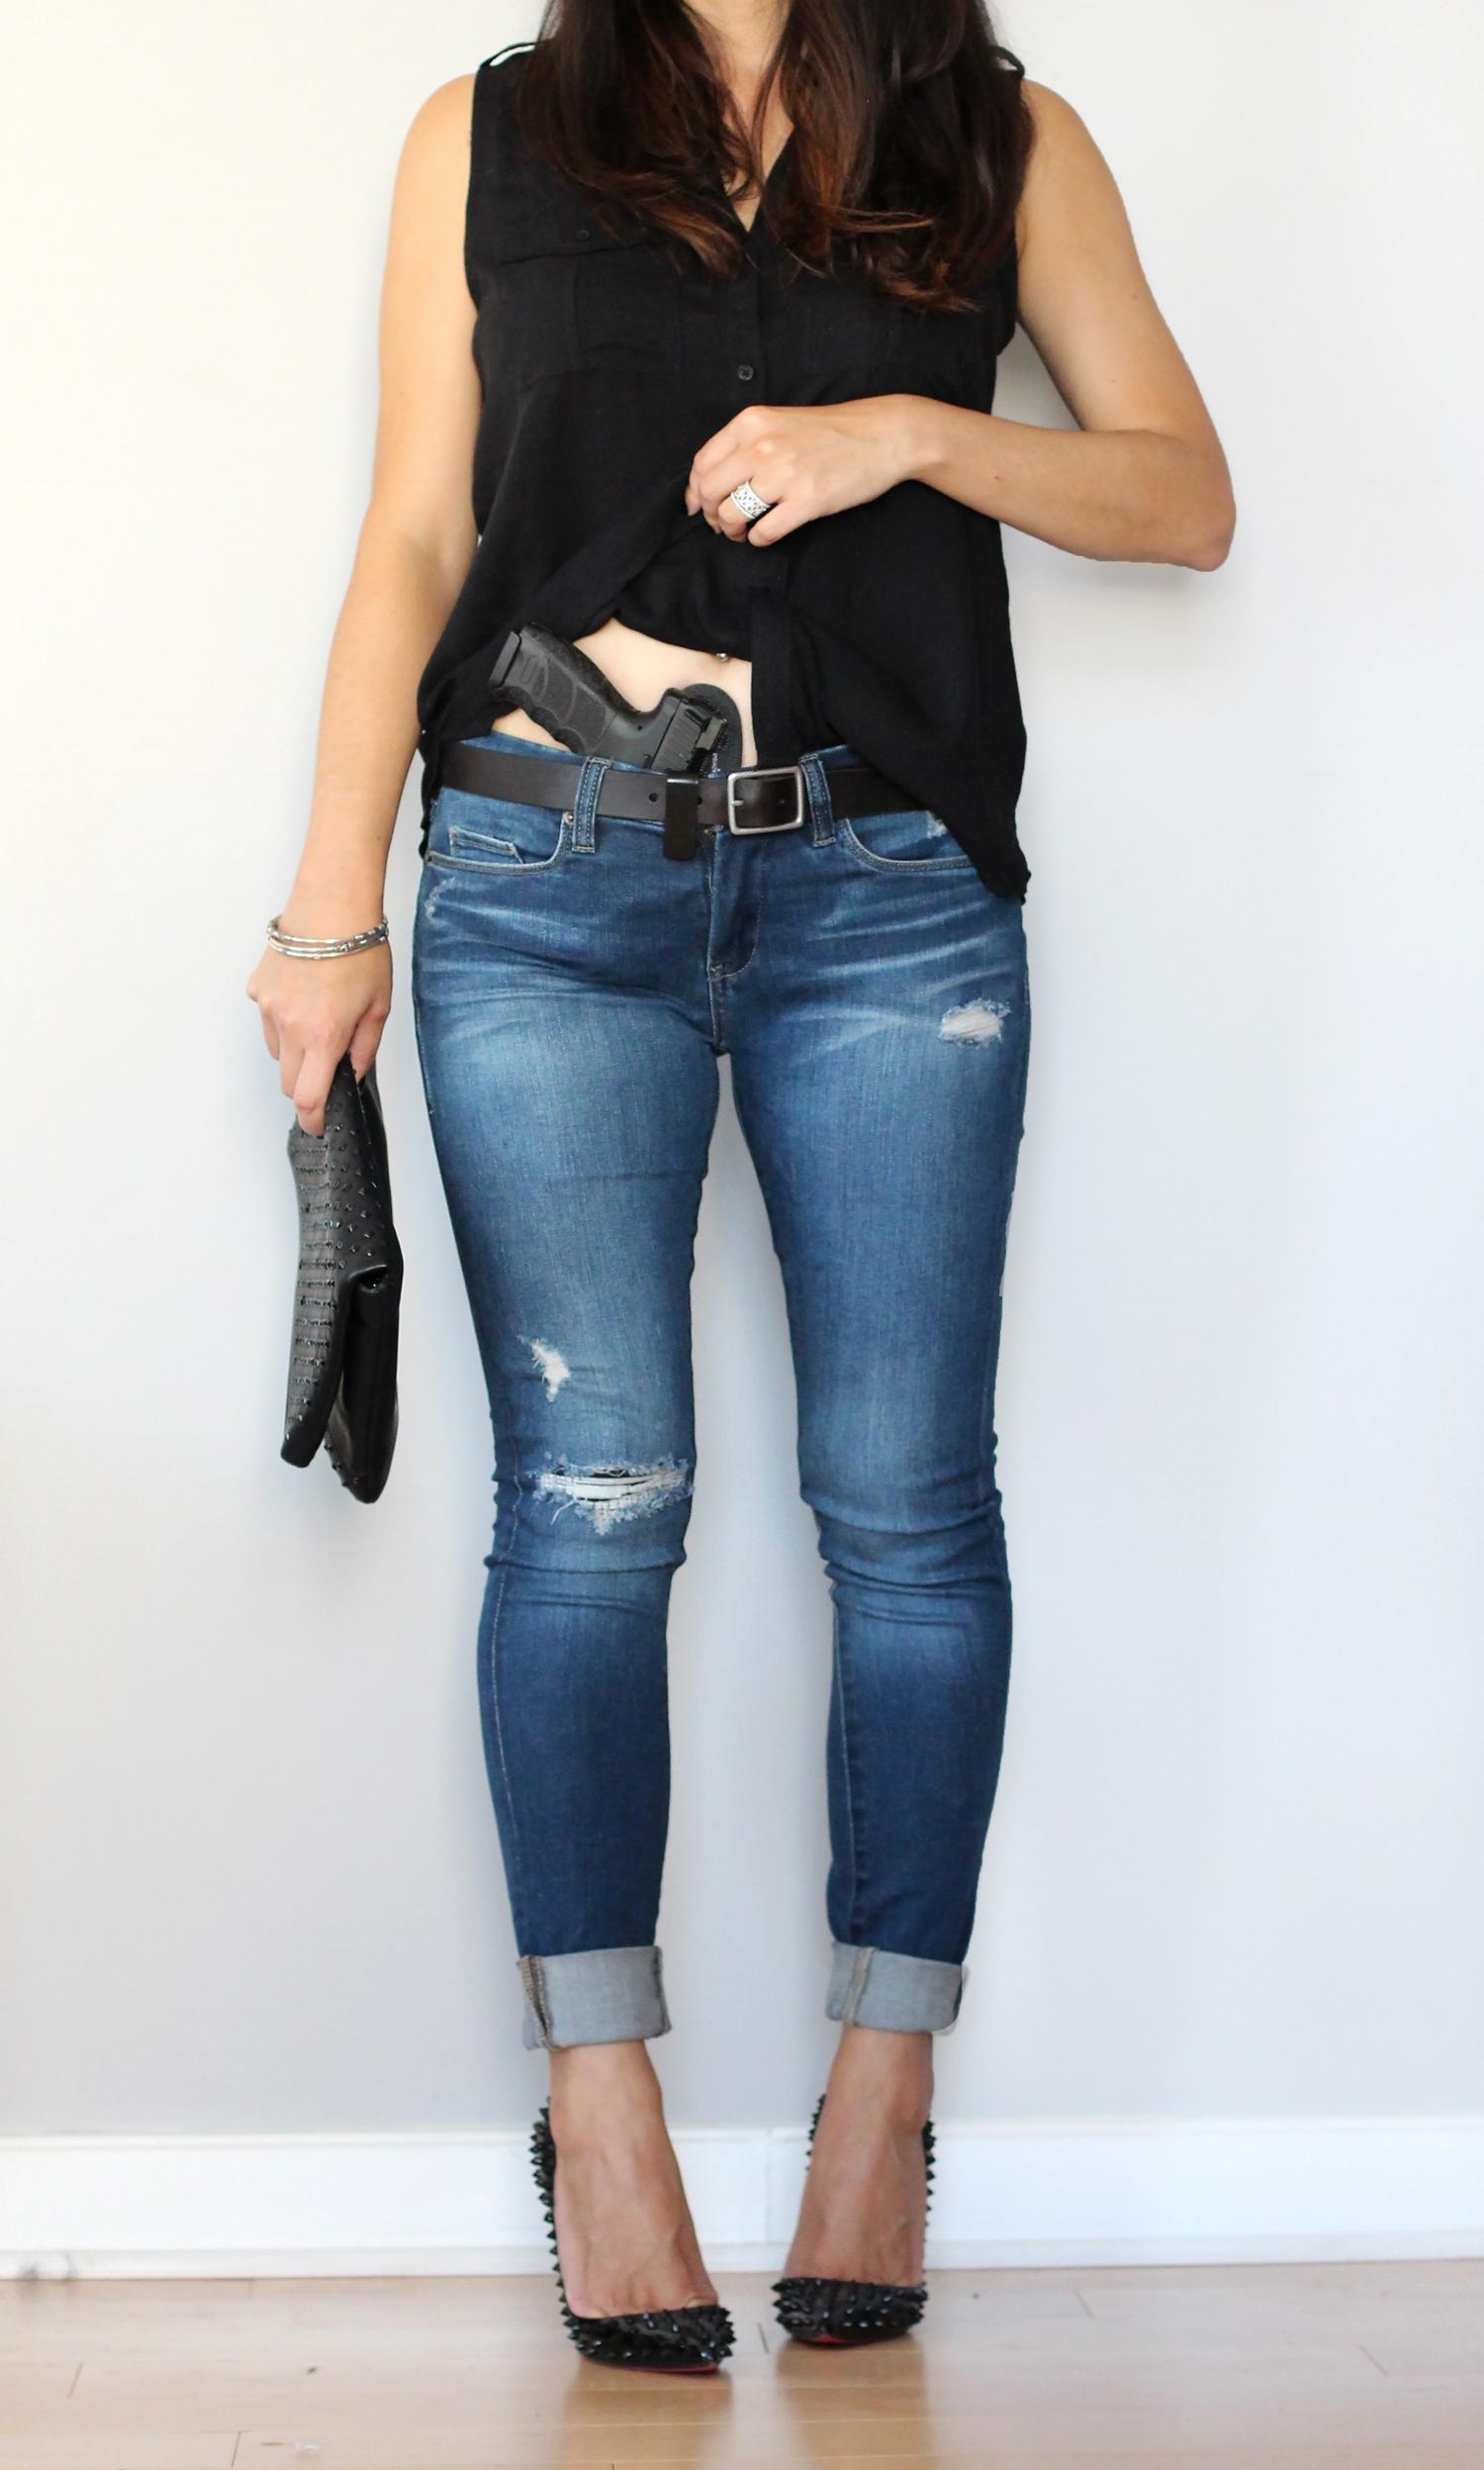 Beginner Tips for Carry Concealed